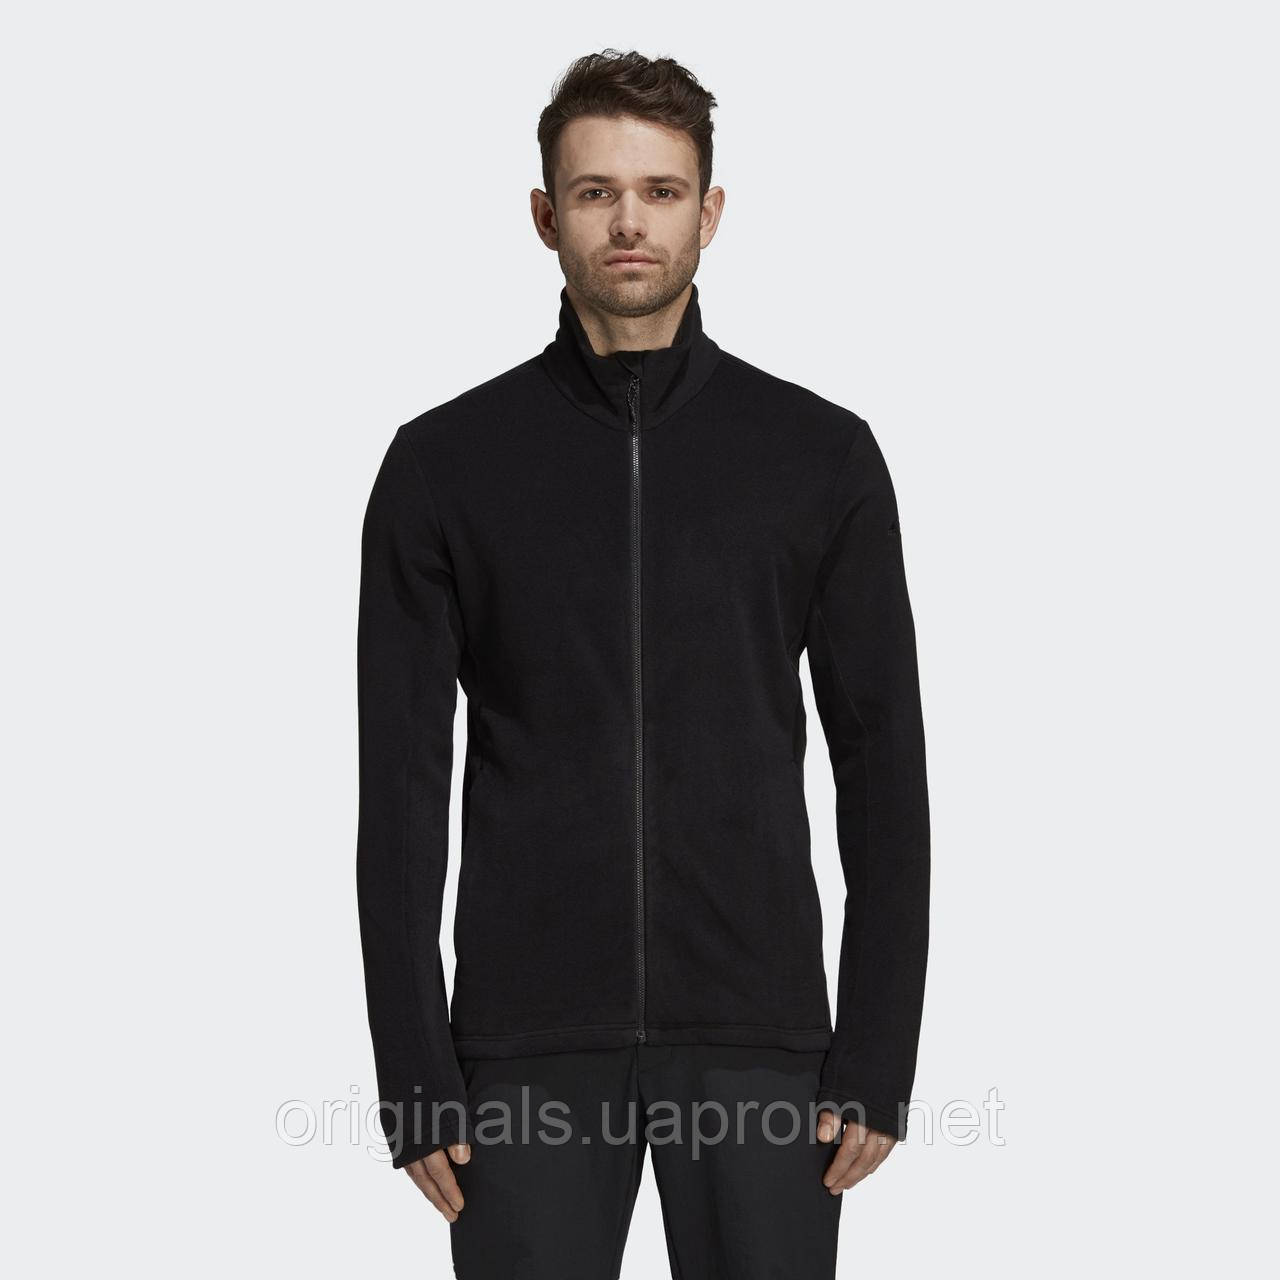 Джемпер мужской Adidas Tivid CY8709